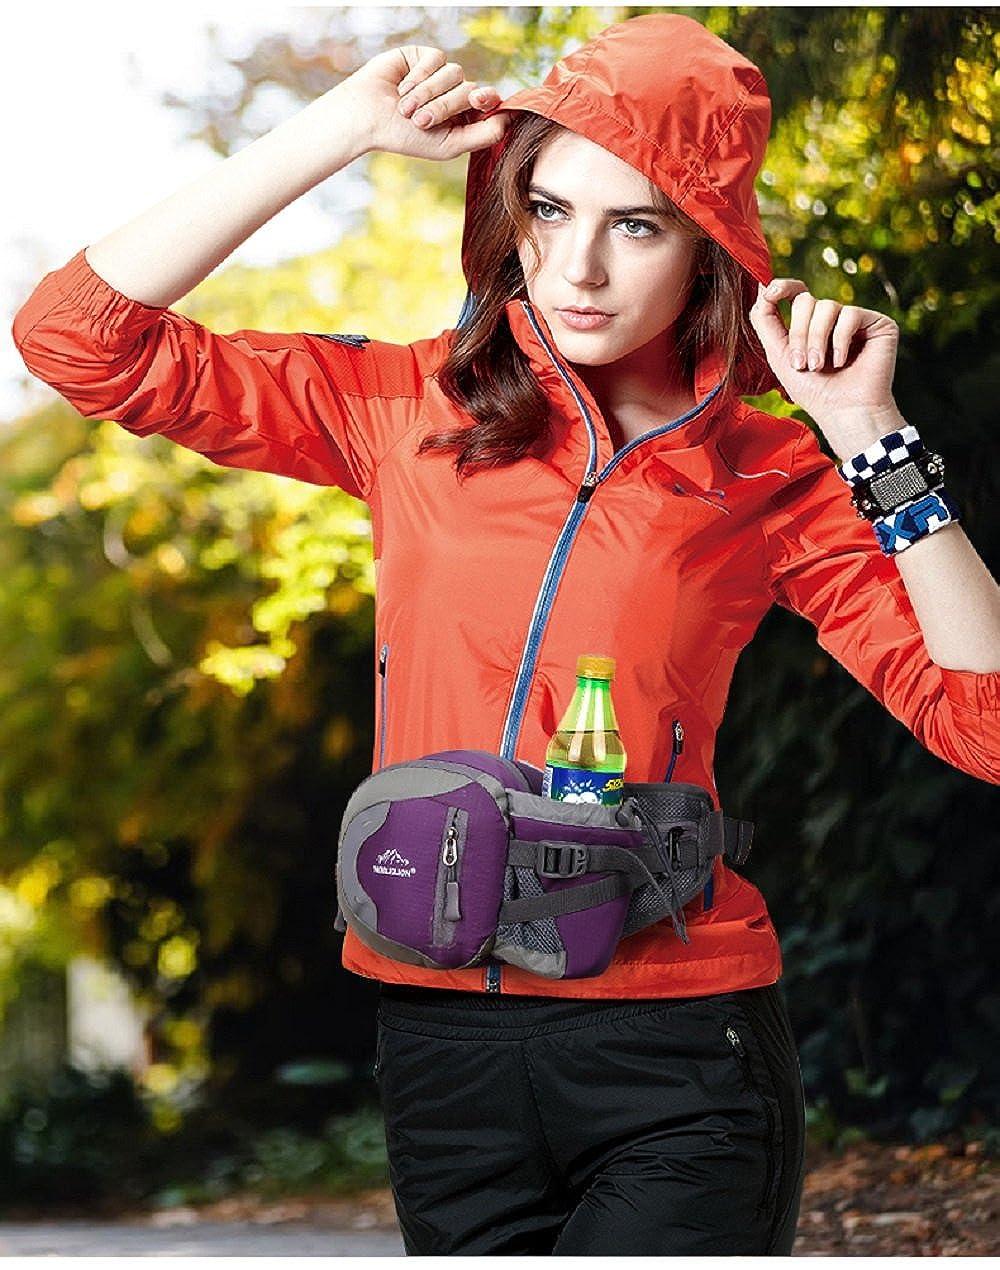 RF Sport Waterproof Waist Bag for Running Travel Outdoor Sports Unisex